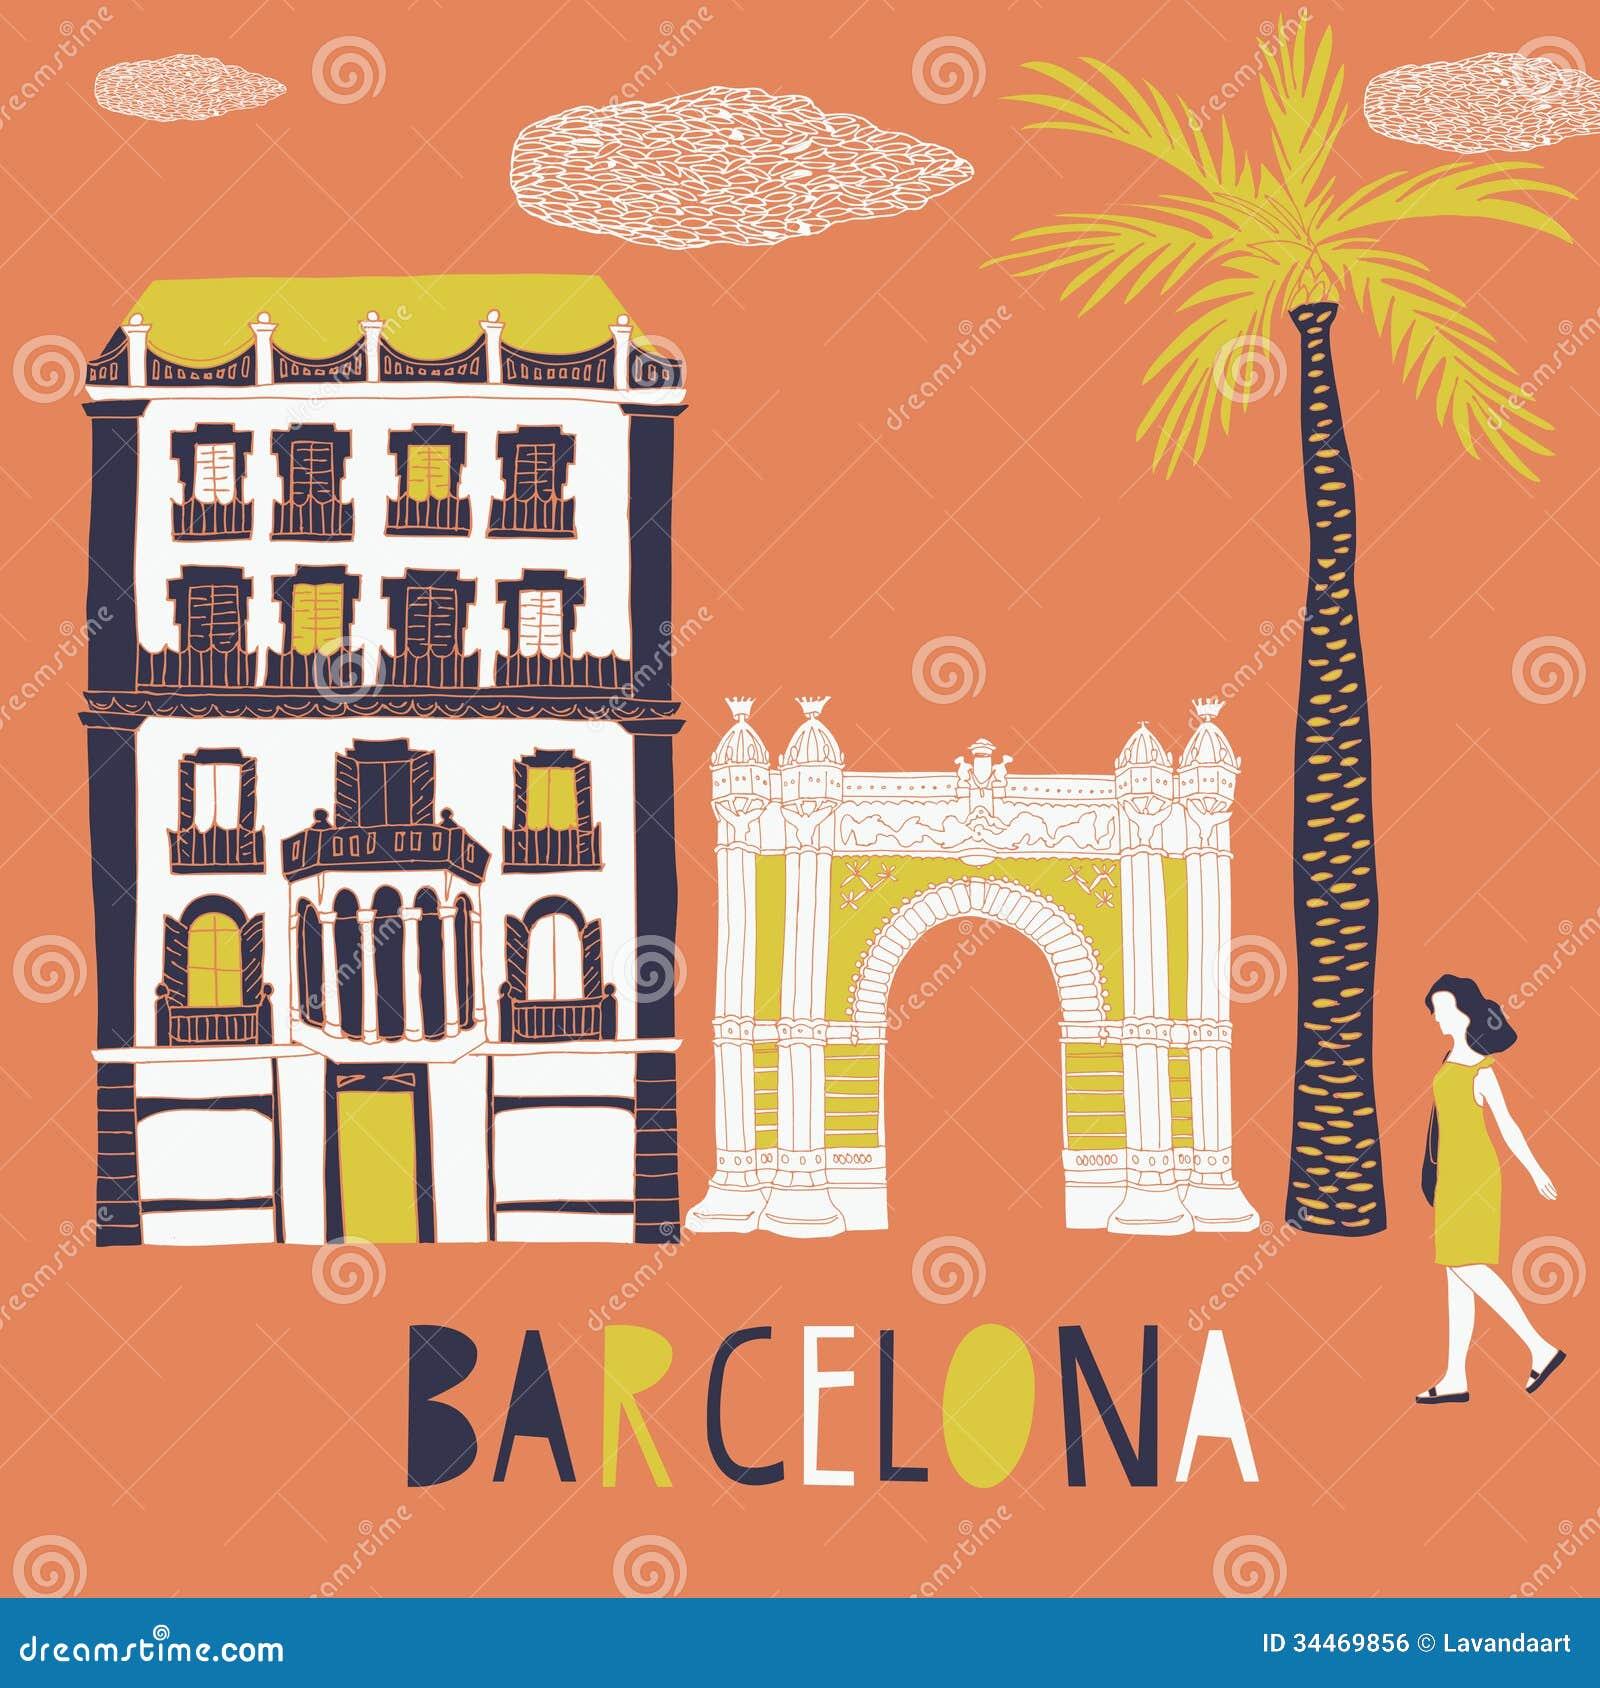 barcelona  print design royalty free stock image